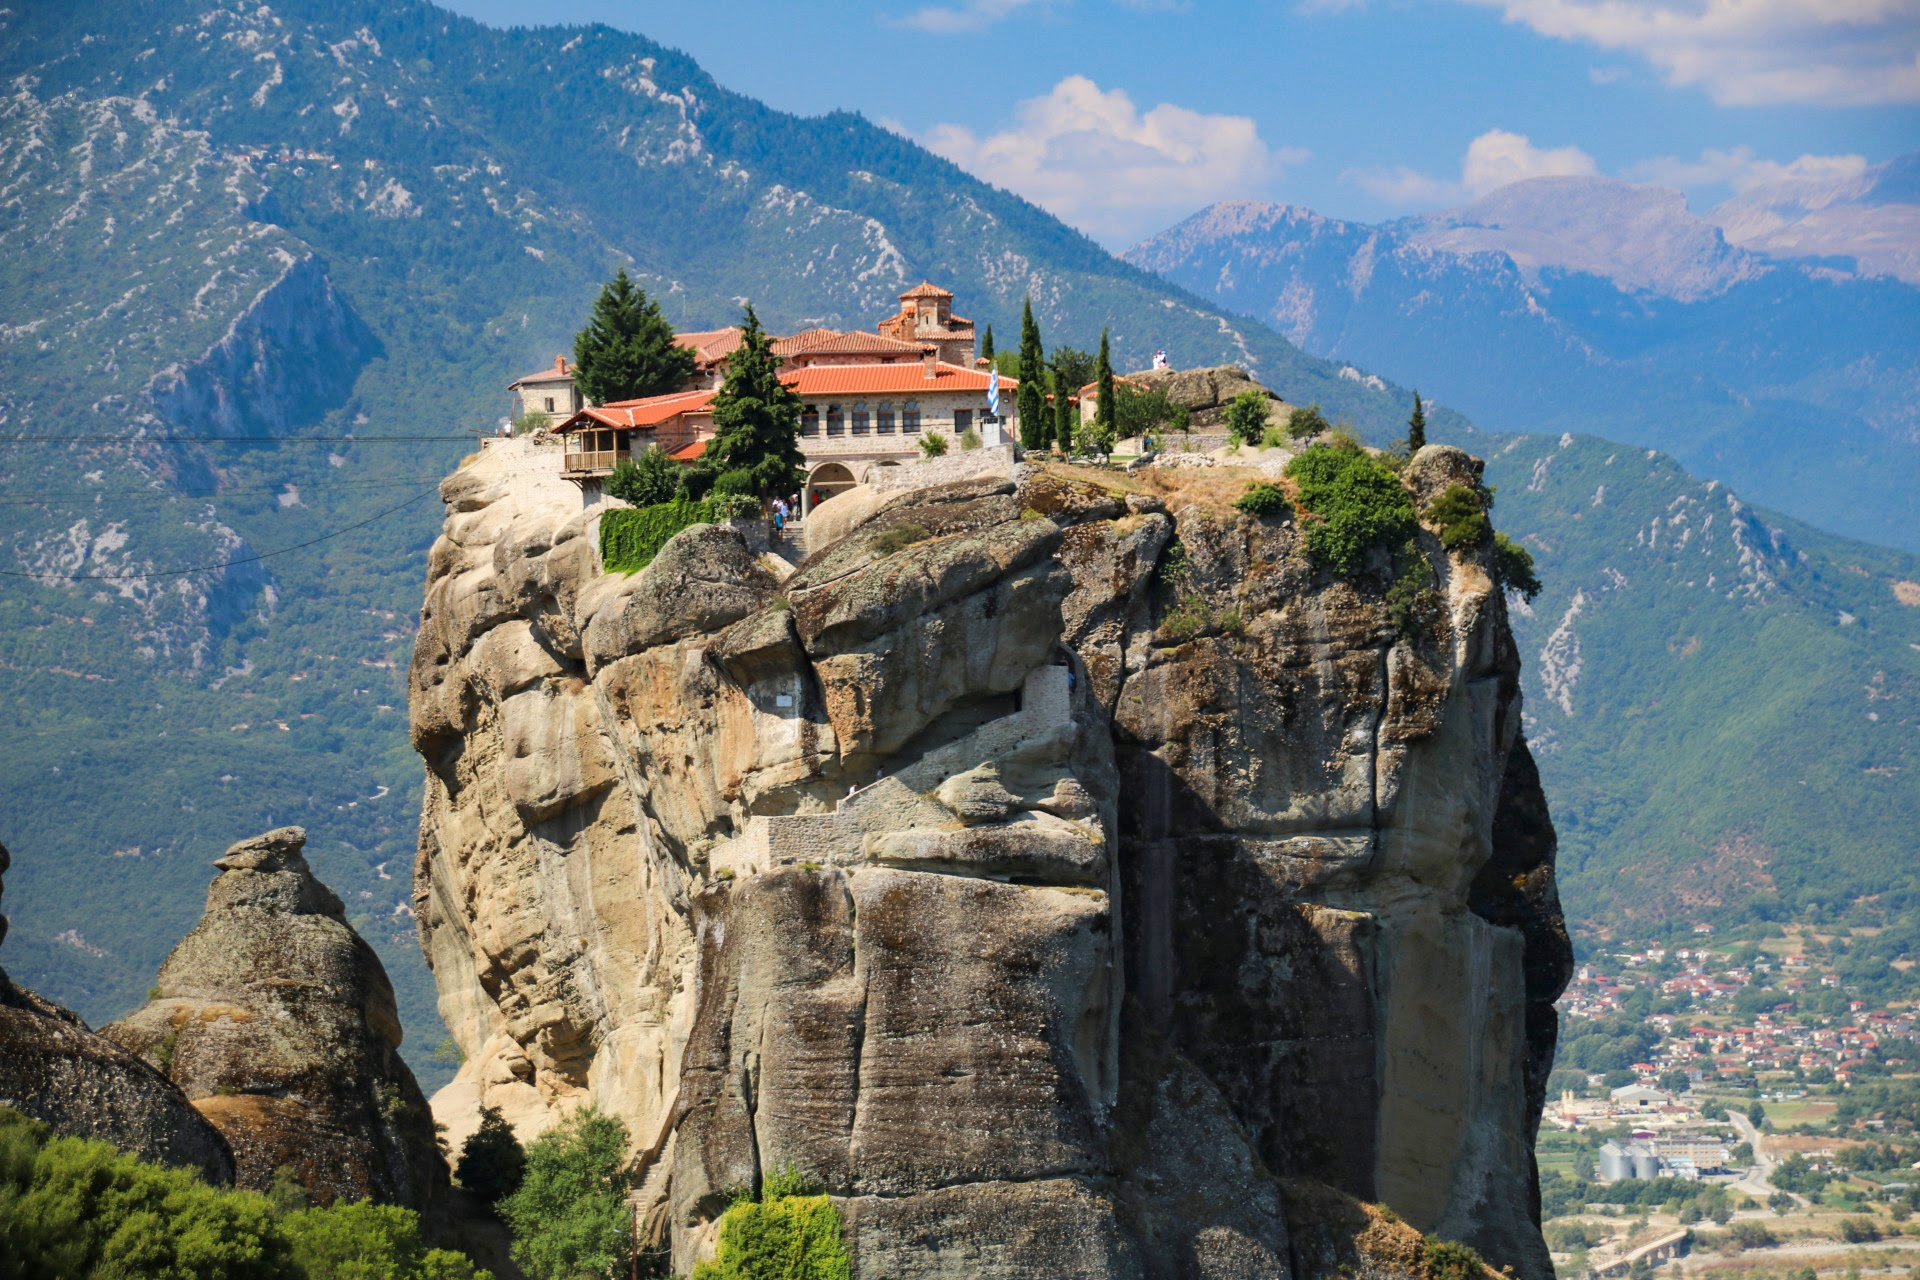 Greece, Meteora, The Monasteries Of Meteora